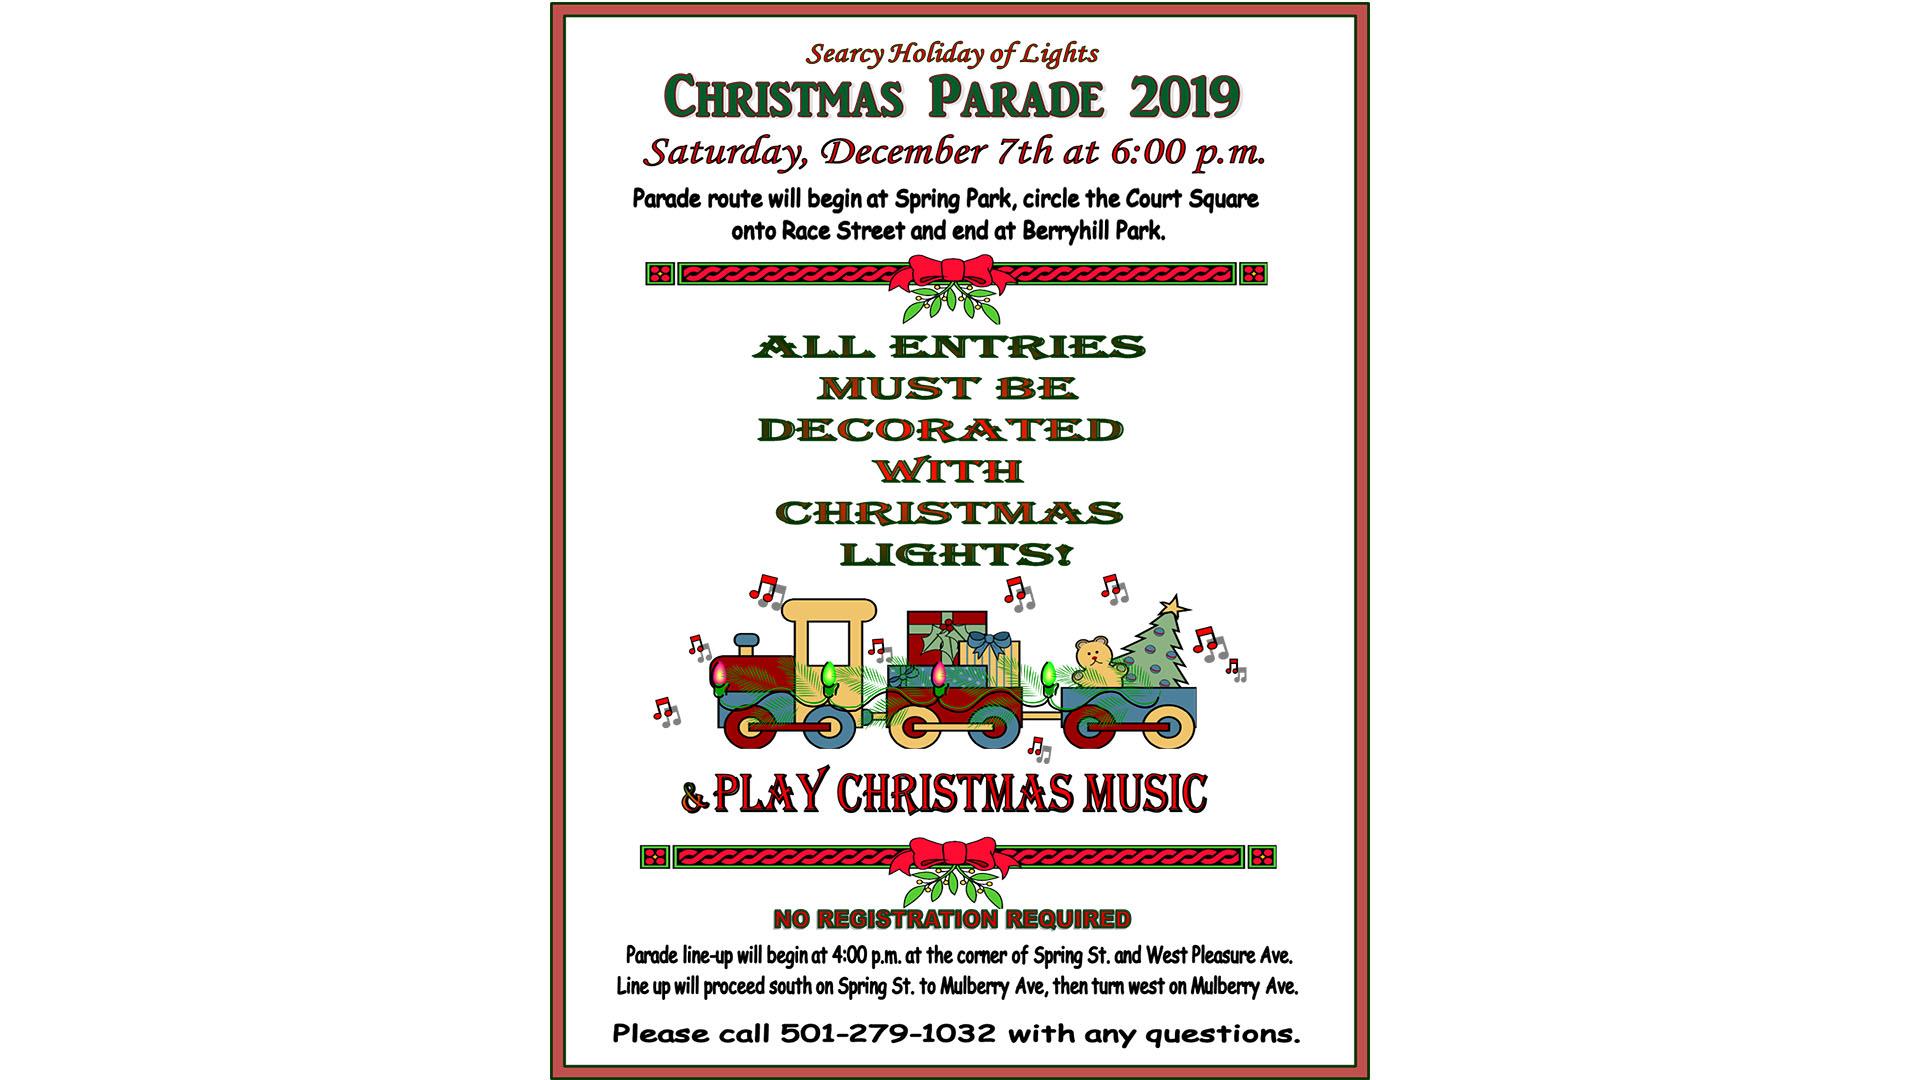 Searcy Christmas Parade 2020 Searcy Holiday of Lights, Christmas Parade | KARK